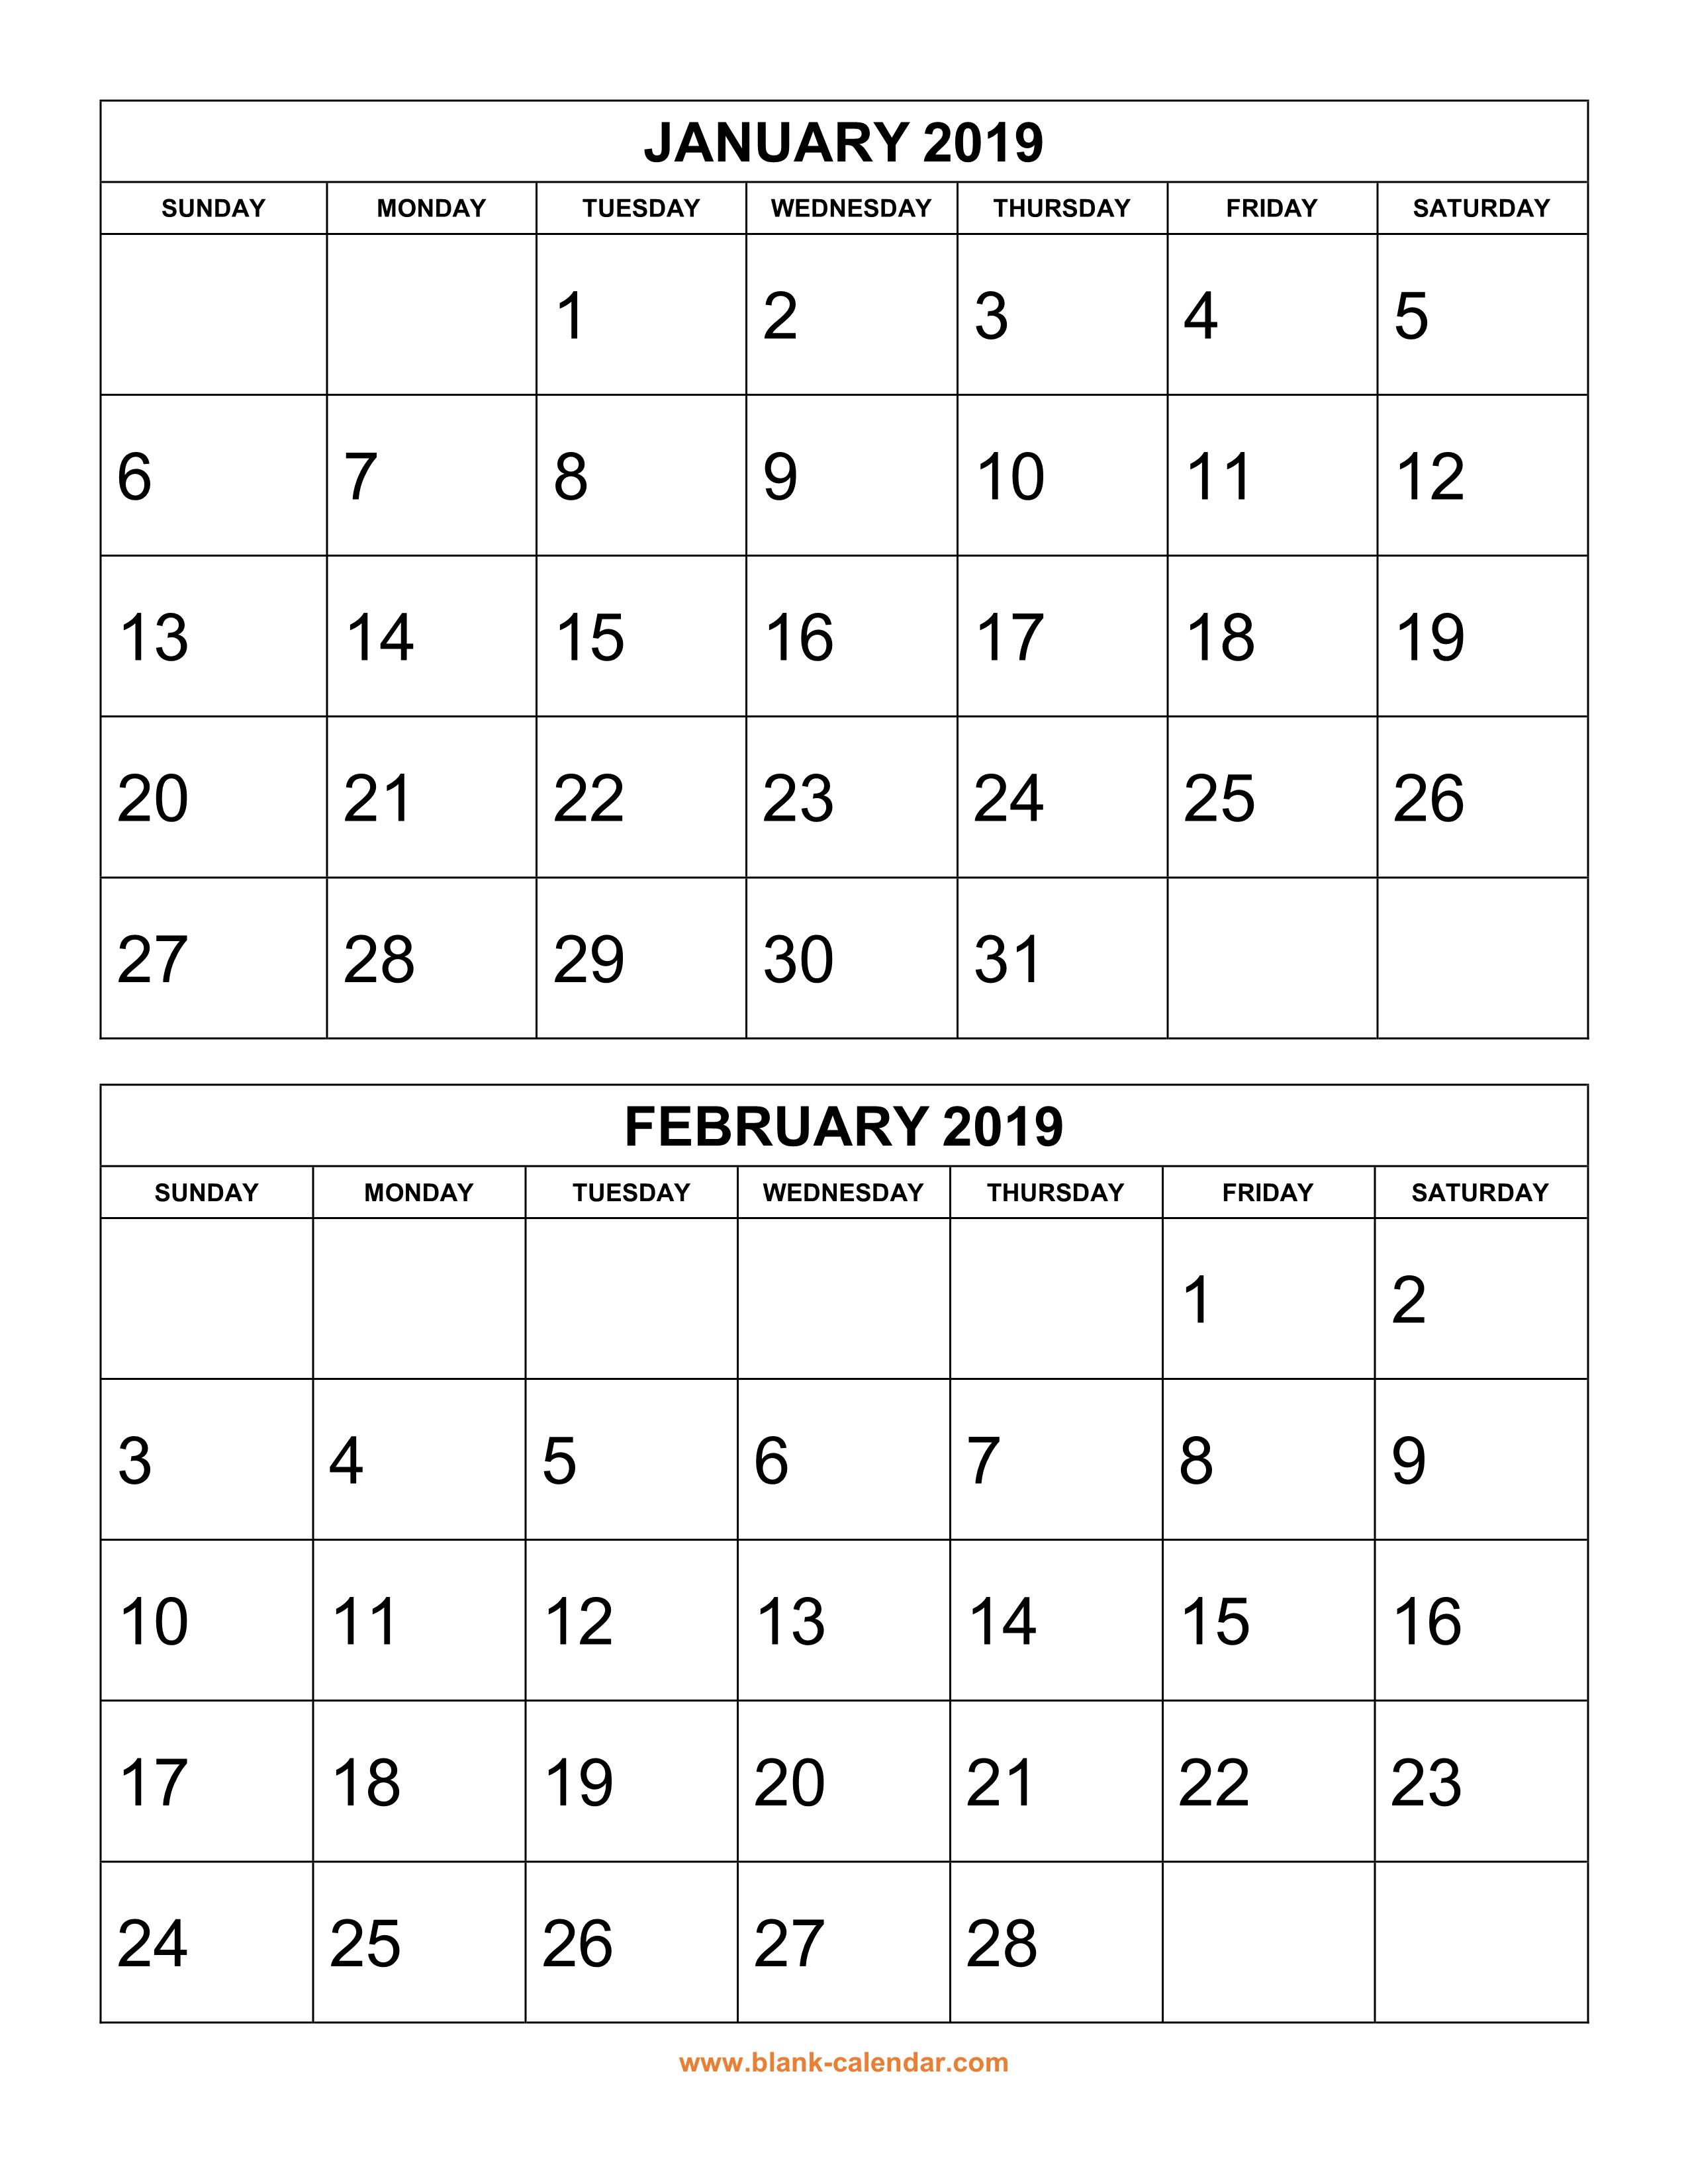 Print Calendar 2 Months Per Page - Colona.rsd7